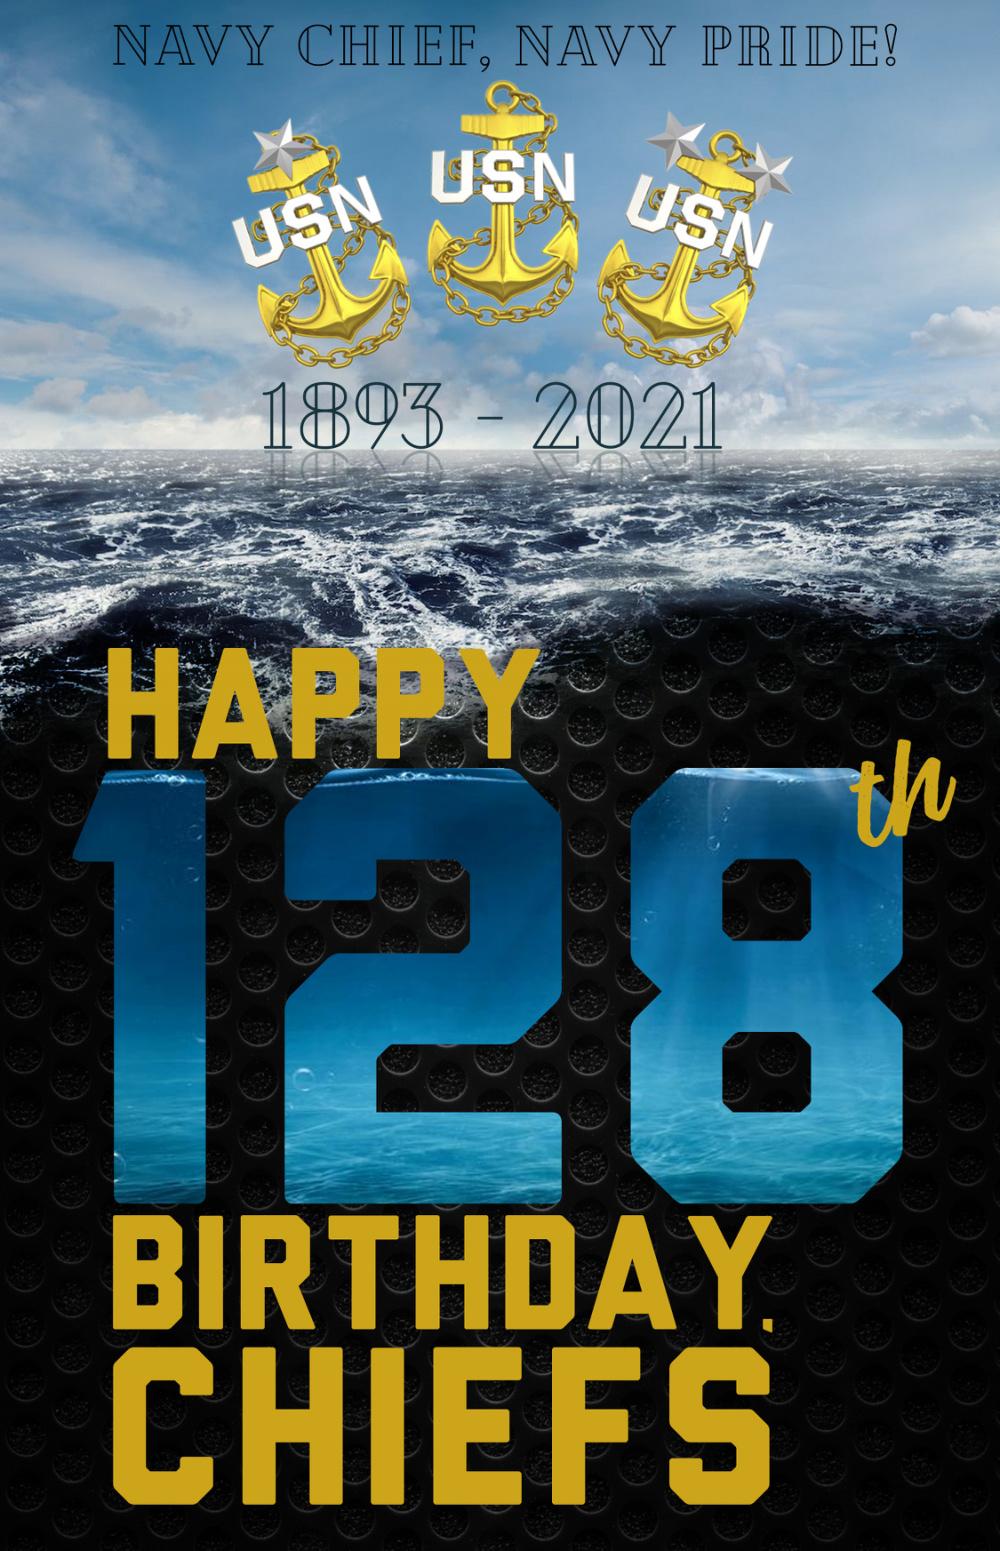 Celebrating Navy Chief Petty Officers 128th Birthday